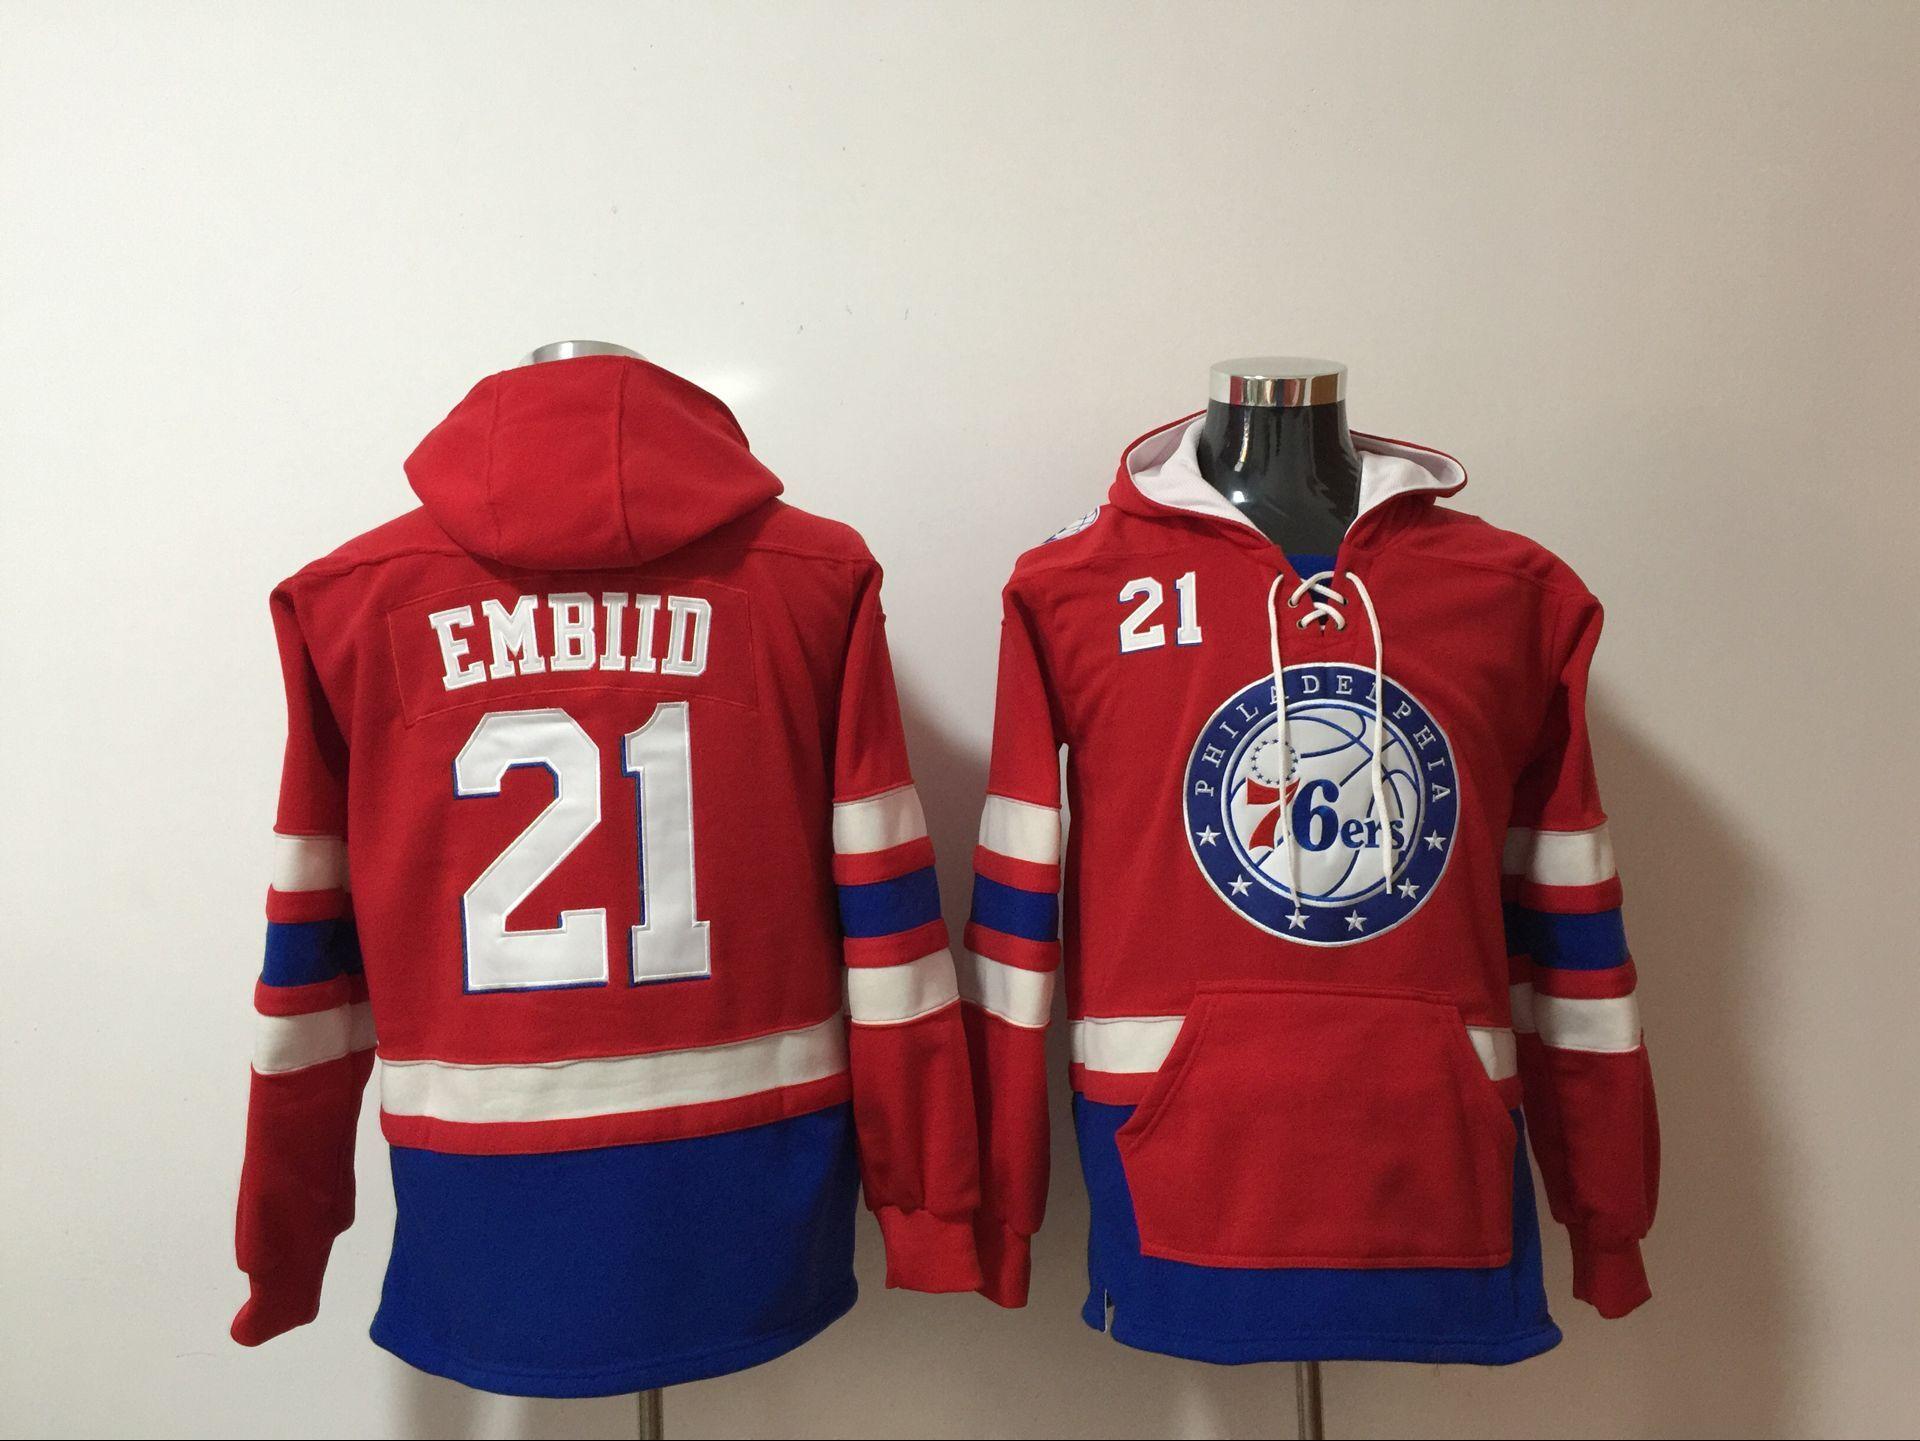 Philadelphia 76ers 21 Joel Embiid Red All Stitched Hooded Sweatshirt